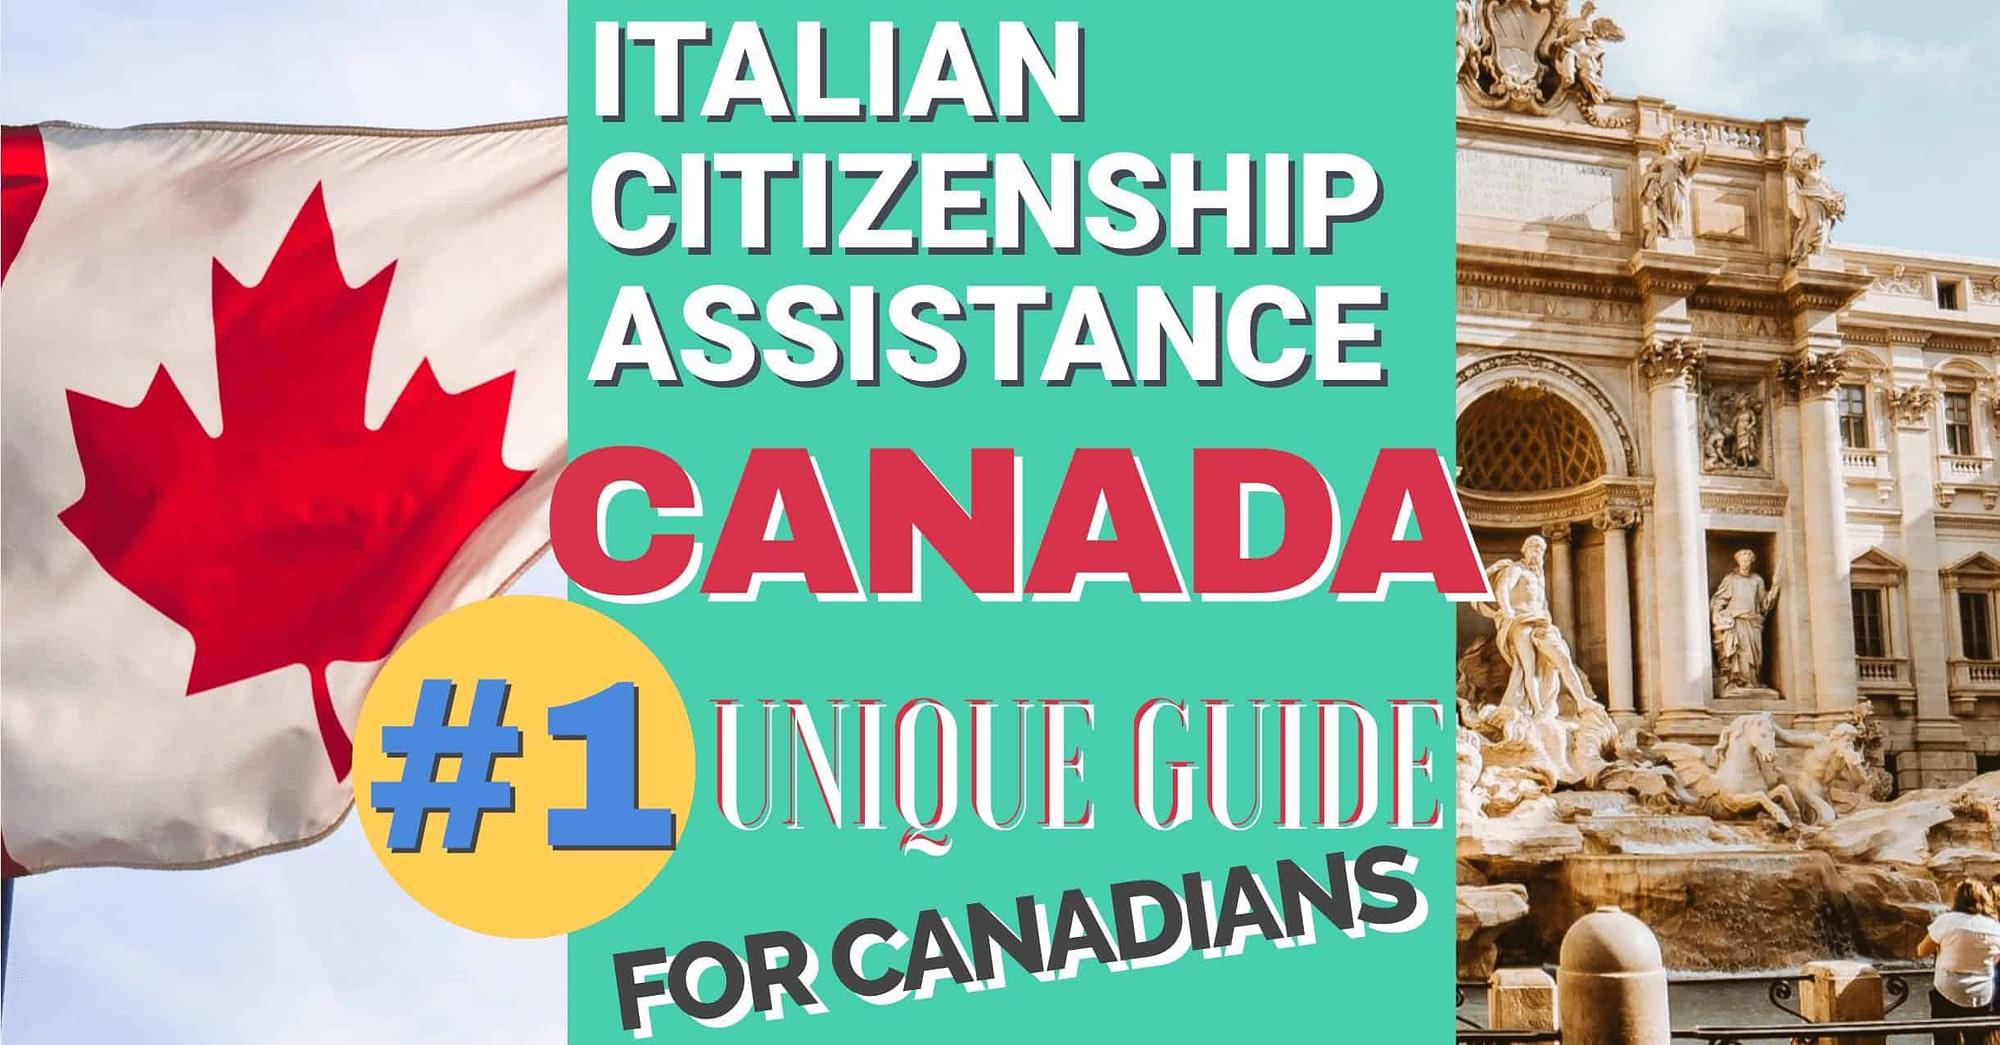 italian-citizenship-assistance-canada-ITALIAN CITIZENSHIP BY DESCENT canada italian citizenship through grandparents canada DESCENDENDANTS italian-citizeship-jure-sanguinis-boost-italian-citizenship-by-descent-italian-citizenship-processing-time-speed-up-italian-citizenship-by-descent-processing-time-italian-citizenship-assistance-italian-dual-citizenship-lawyer-italian-citizenship-service-italian-citizenship-jure-sanguinis-assistance-boost-italian-citizenship-processing-time-italian-citizeship-jure-sanguinis-boost-italian-citizenship-by-descent-italian-citizenship-processing-time-speed-up-italian-citizenship-by-descent-processing-time-italian-citizenship-assistance-italian-dual-citizenship-lawyer-italian-citizenship-service-italian-citizenship-jure-sanguinis-assistance-boost-italian-citizenship-processing-time